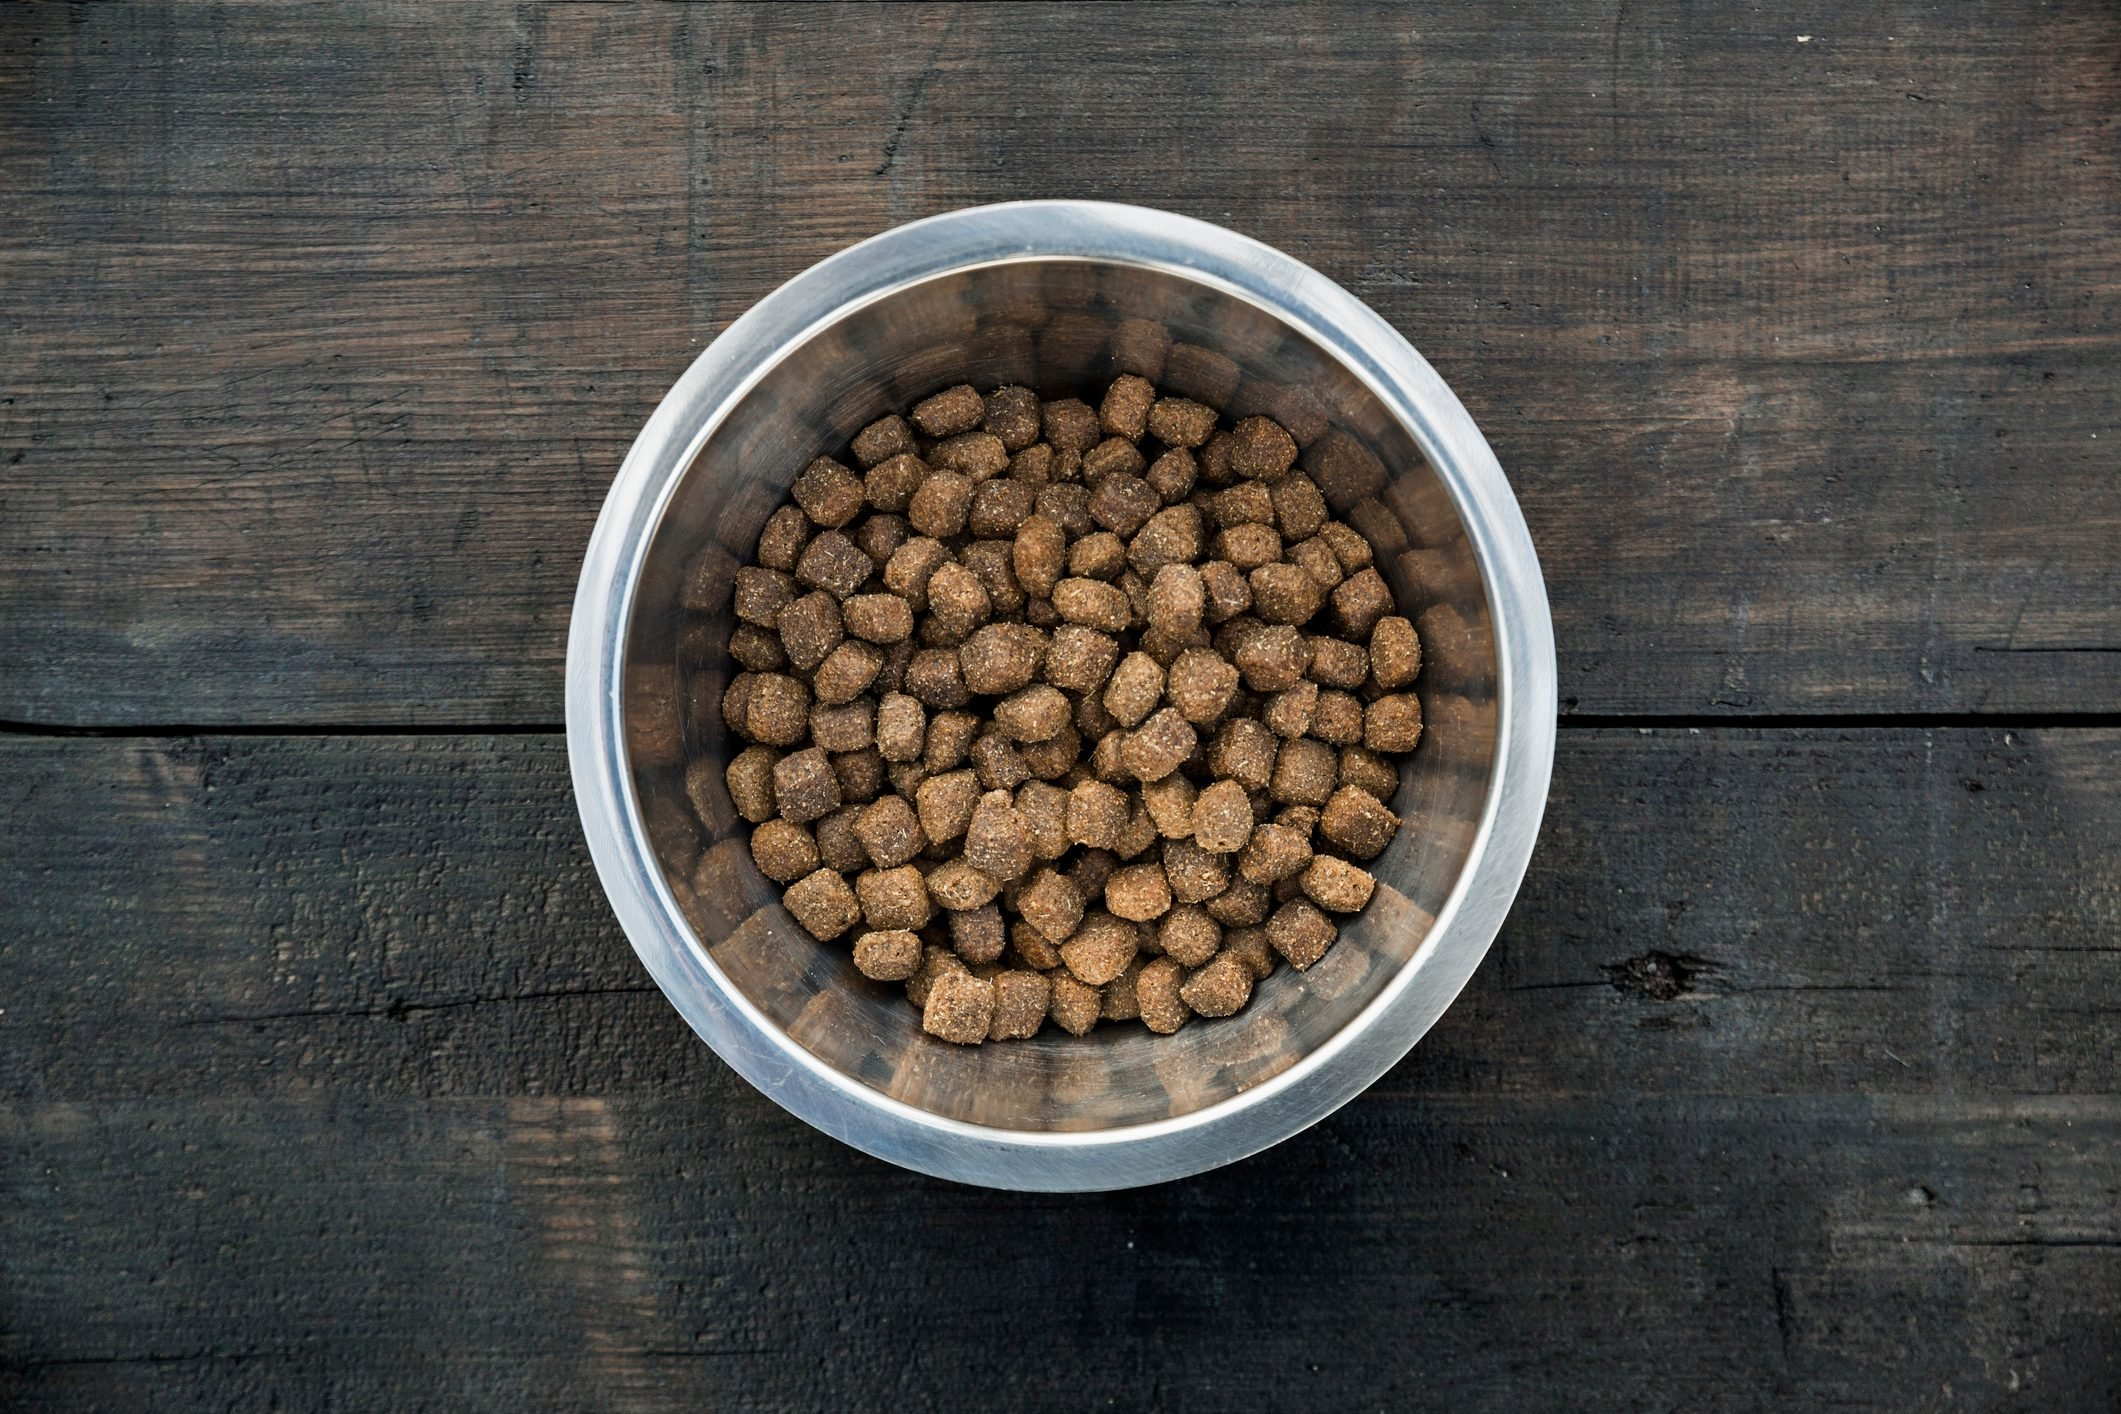 Bowl with dog food